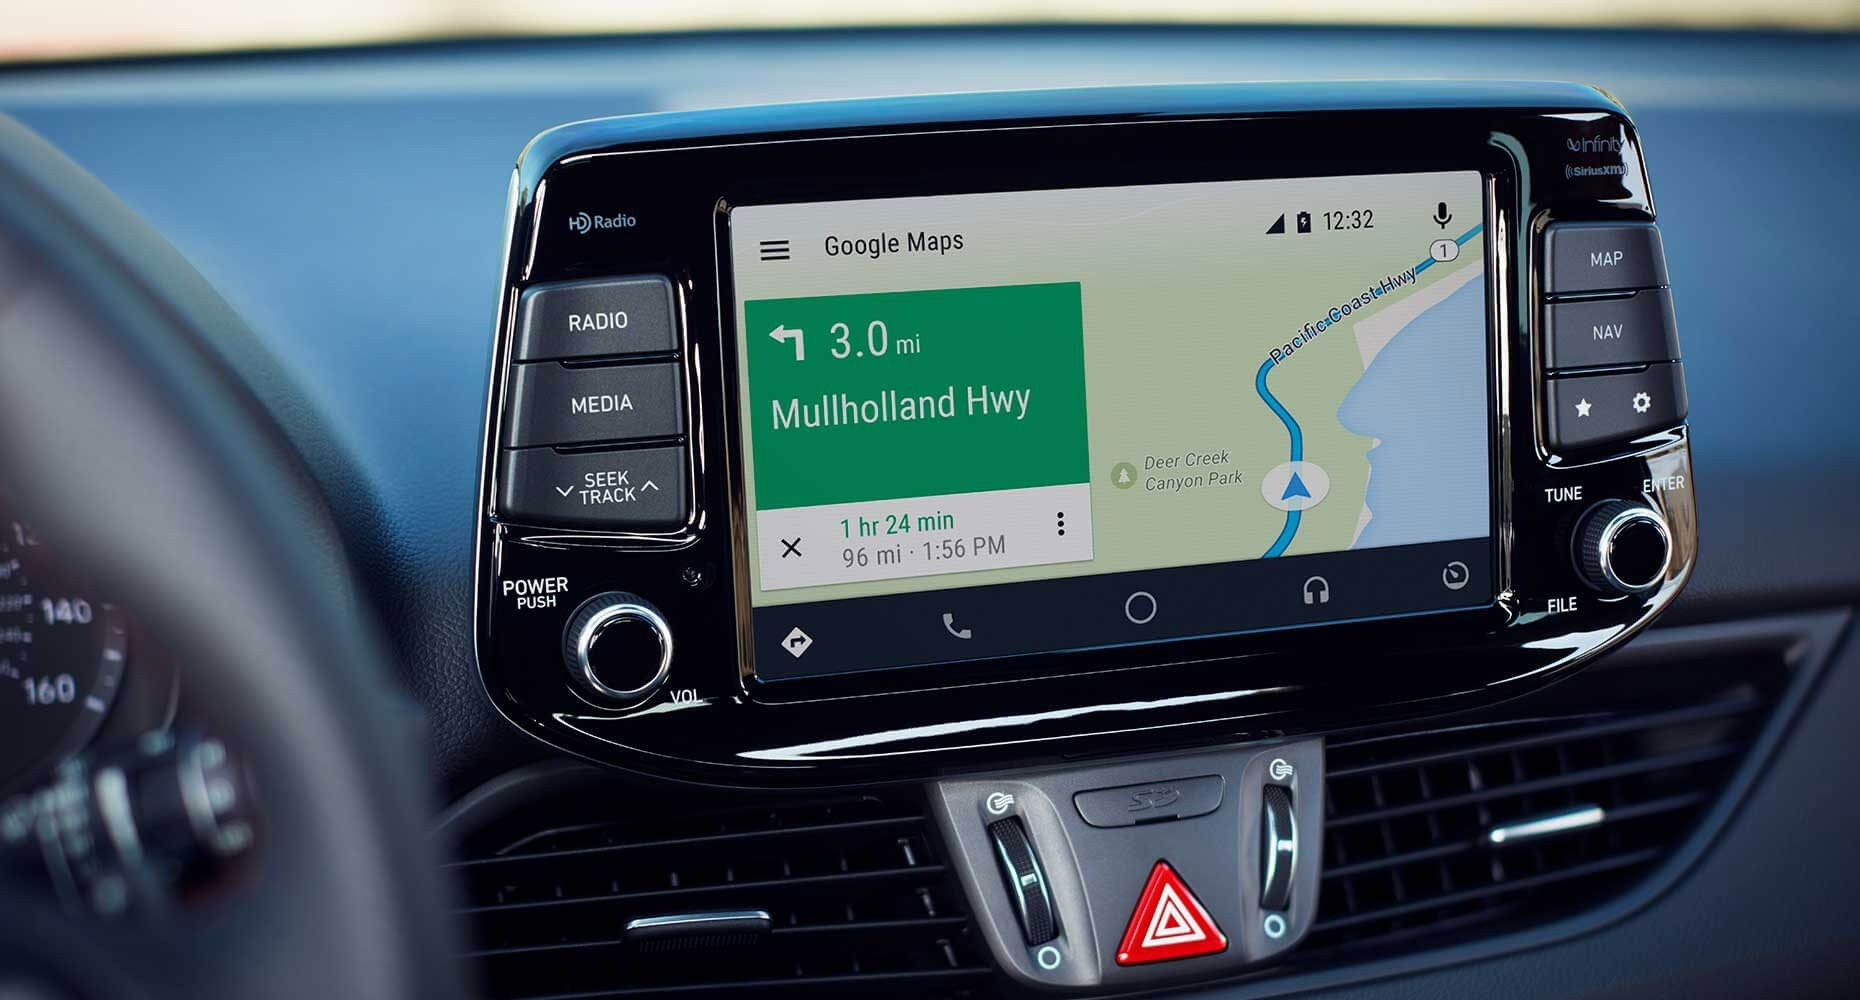 2018 Hyundai Elantra GT navigation